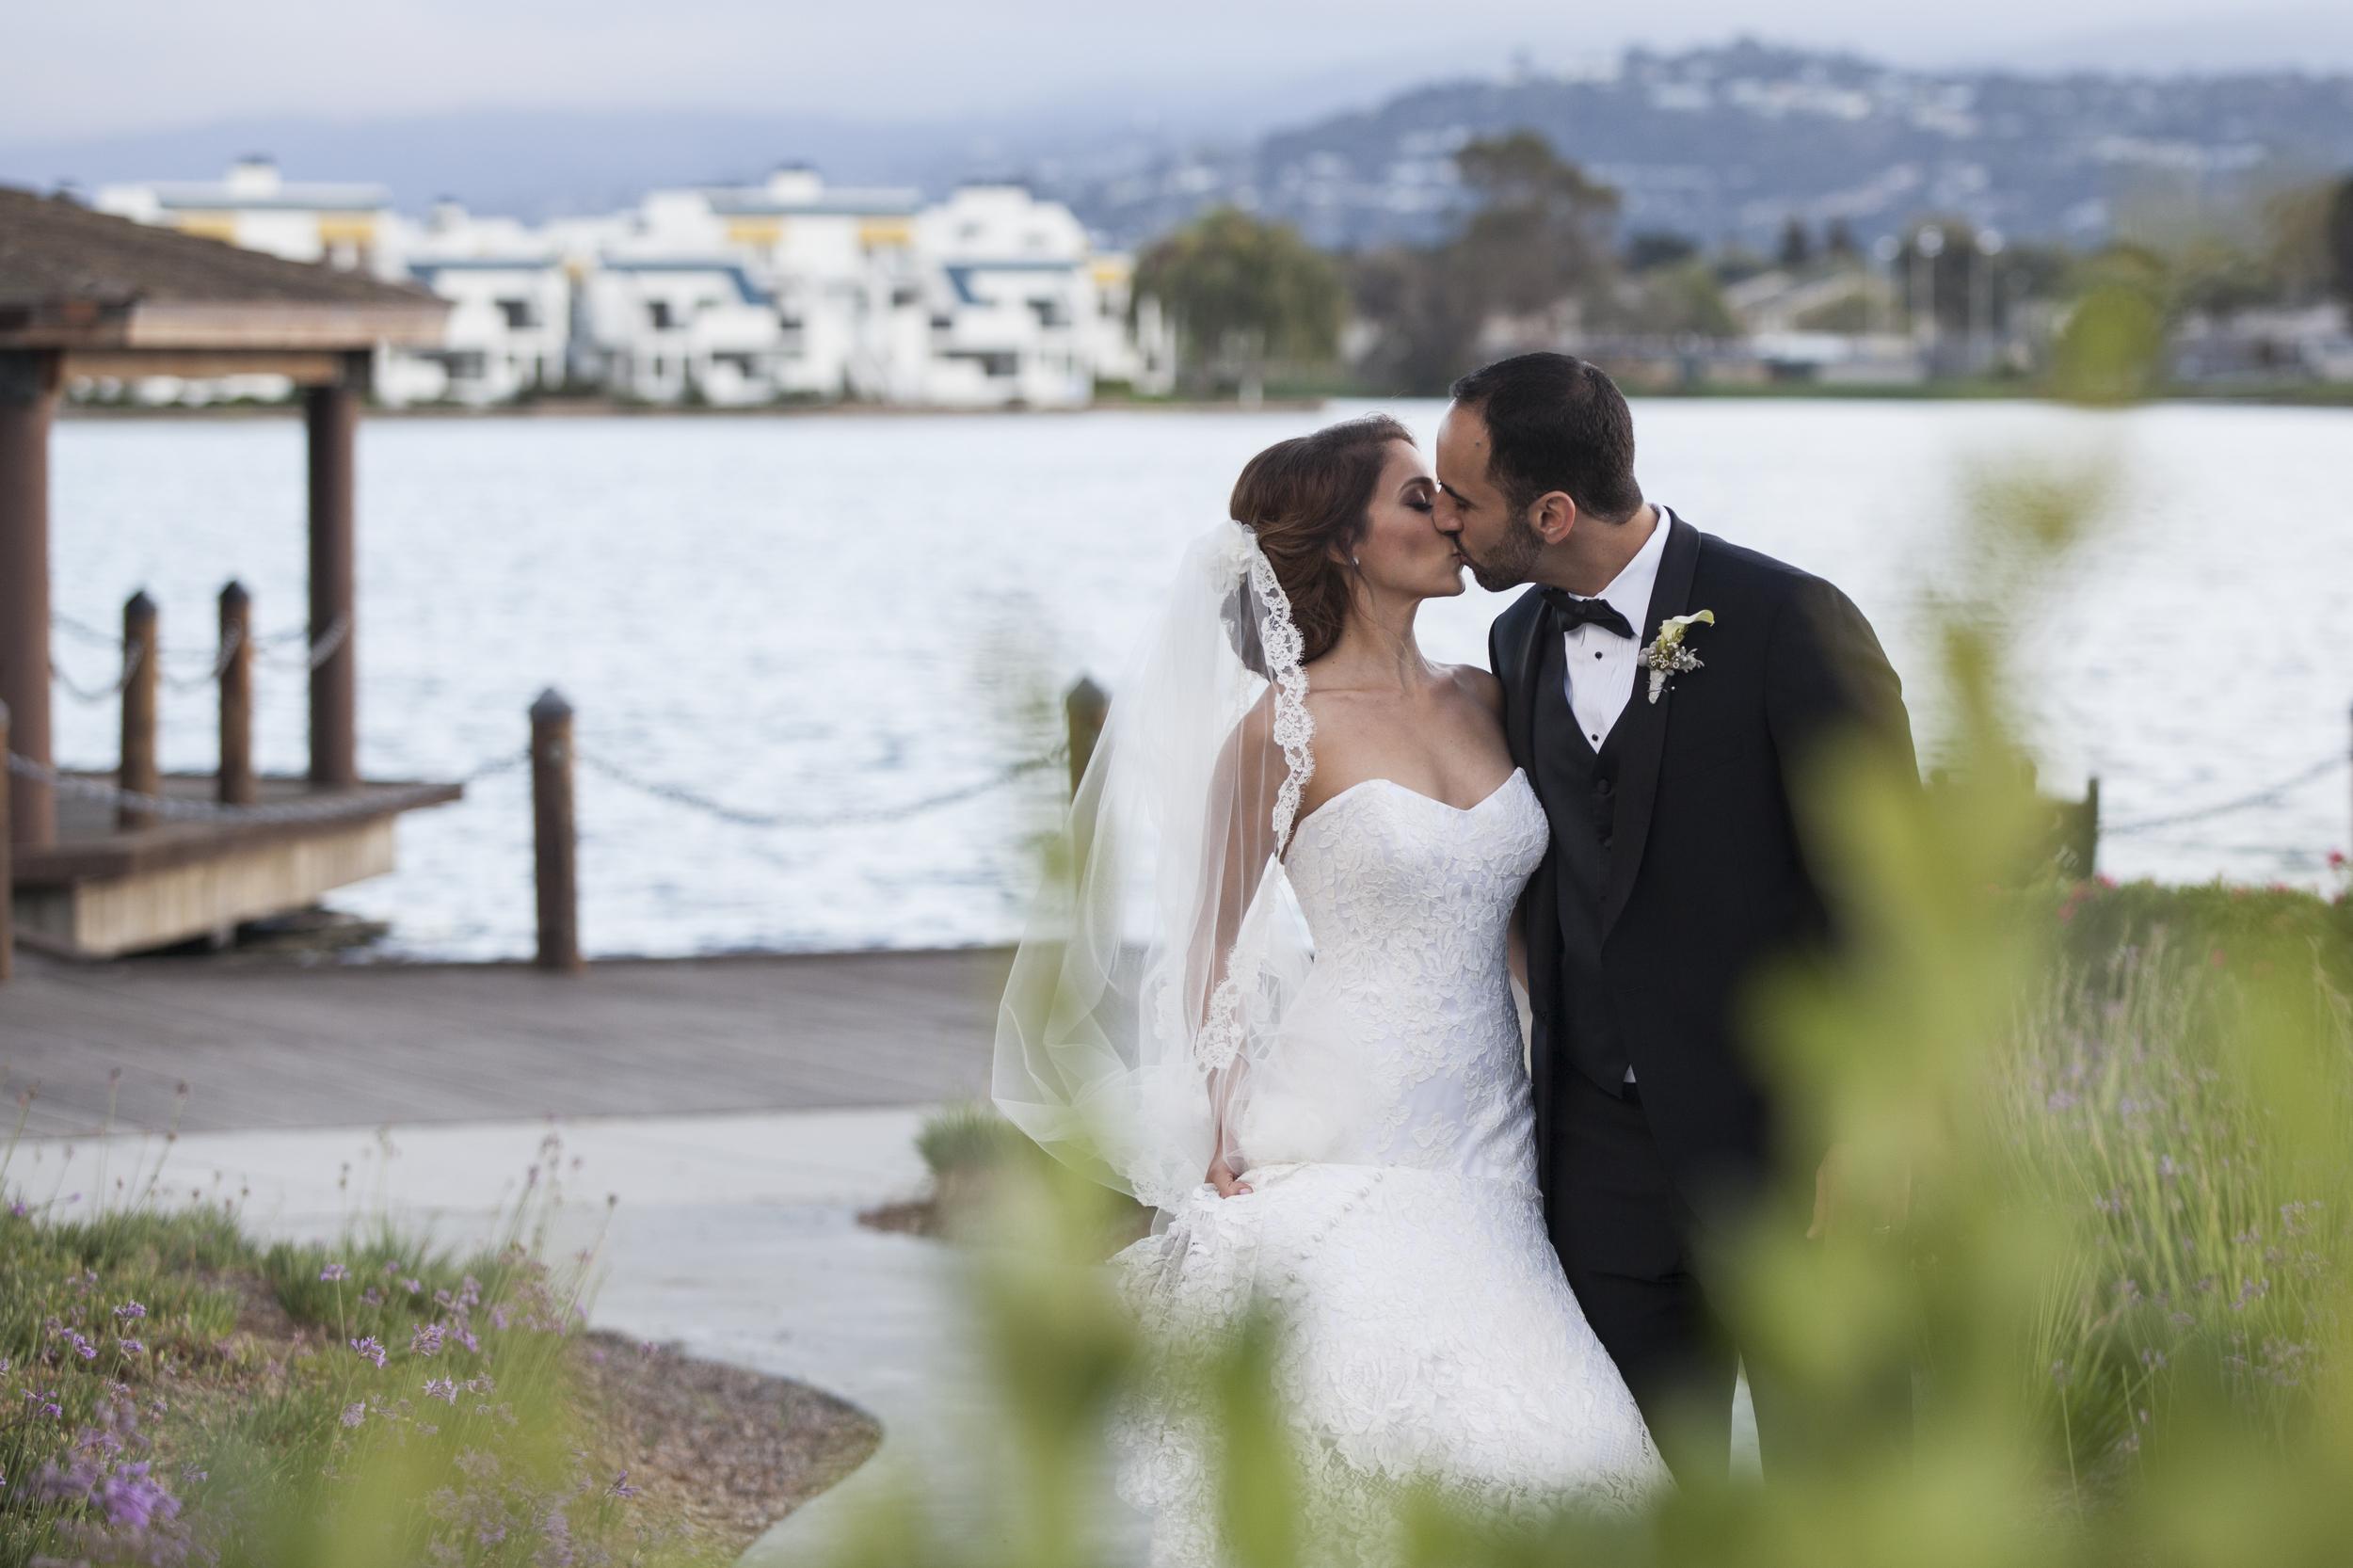 Persian Wedding-South San Francisco-Meo Baaklini27.jpg